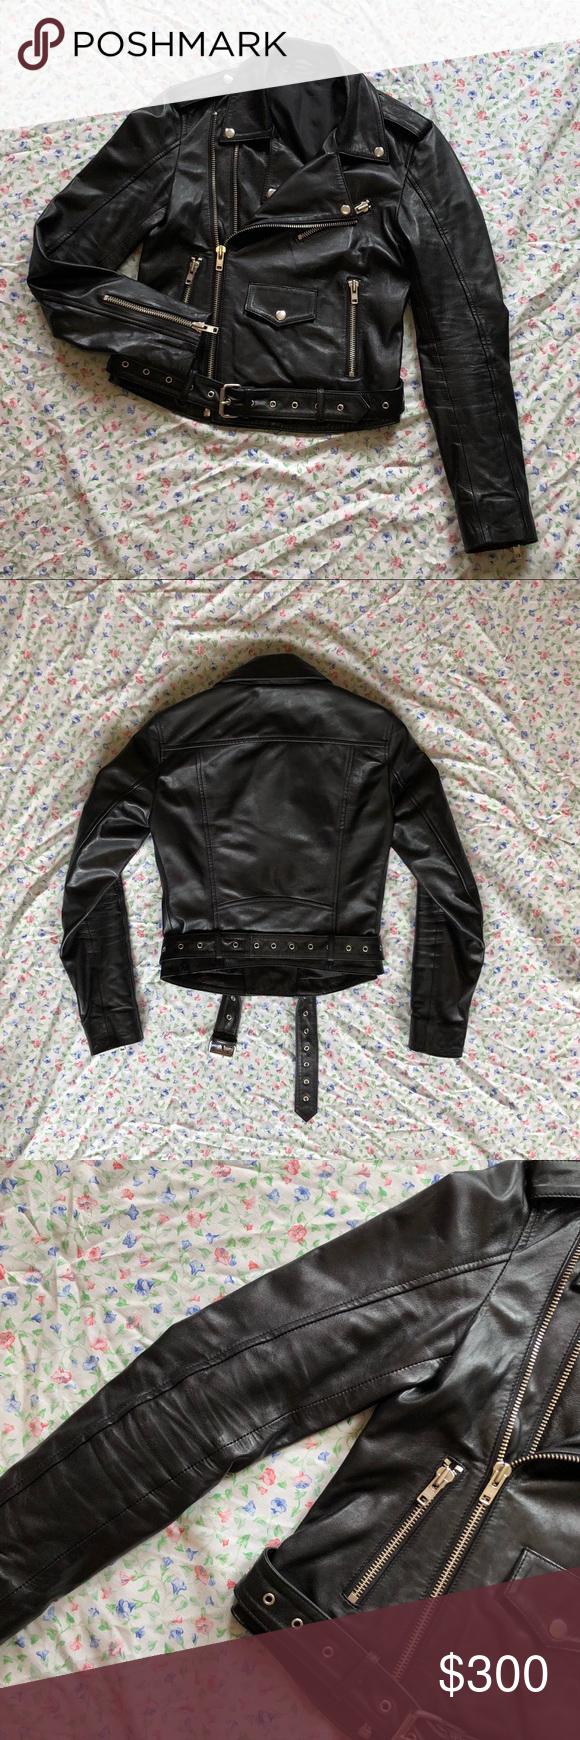 Showroom Sample Leather Jacket I wore this leather jacket